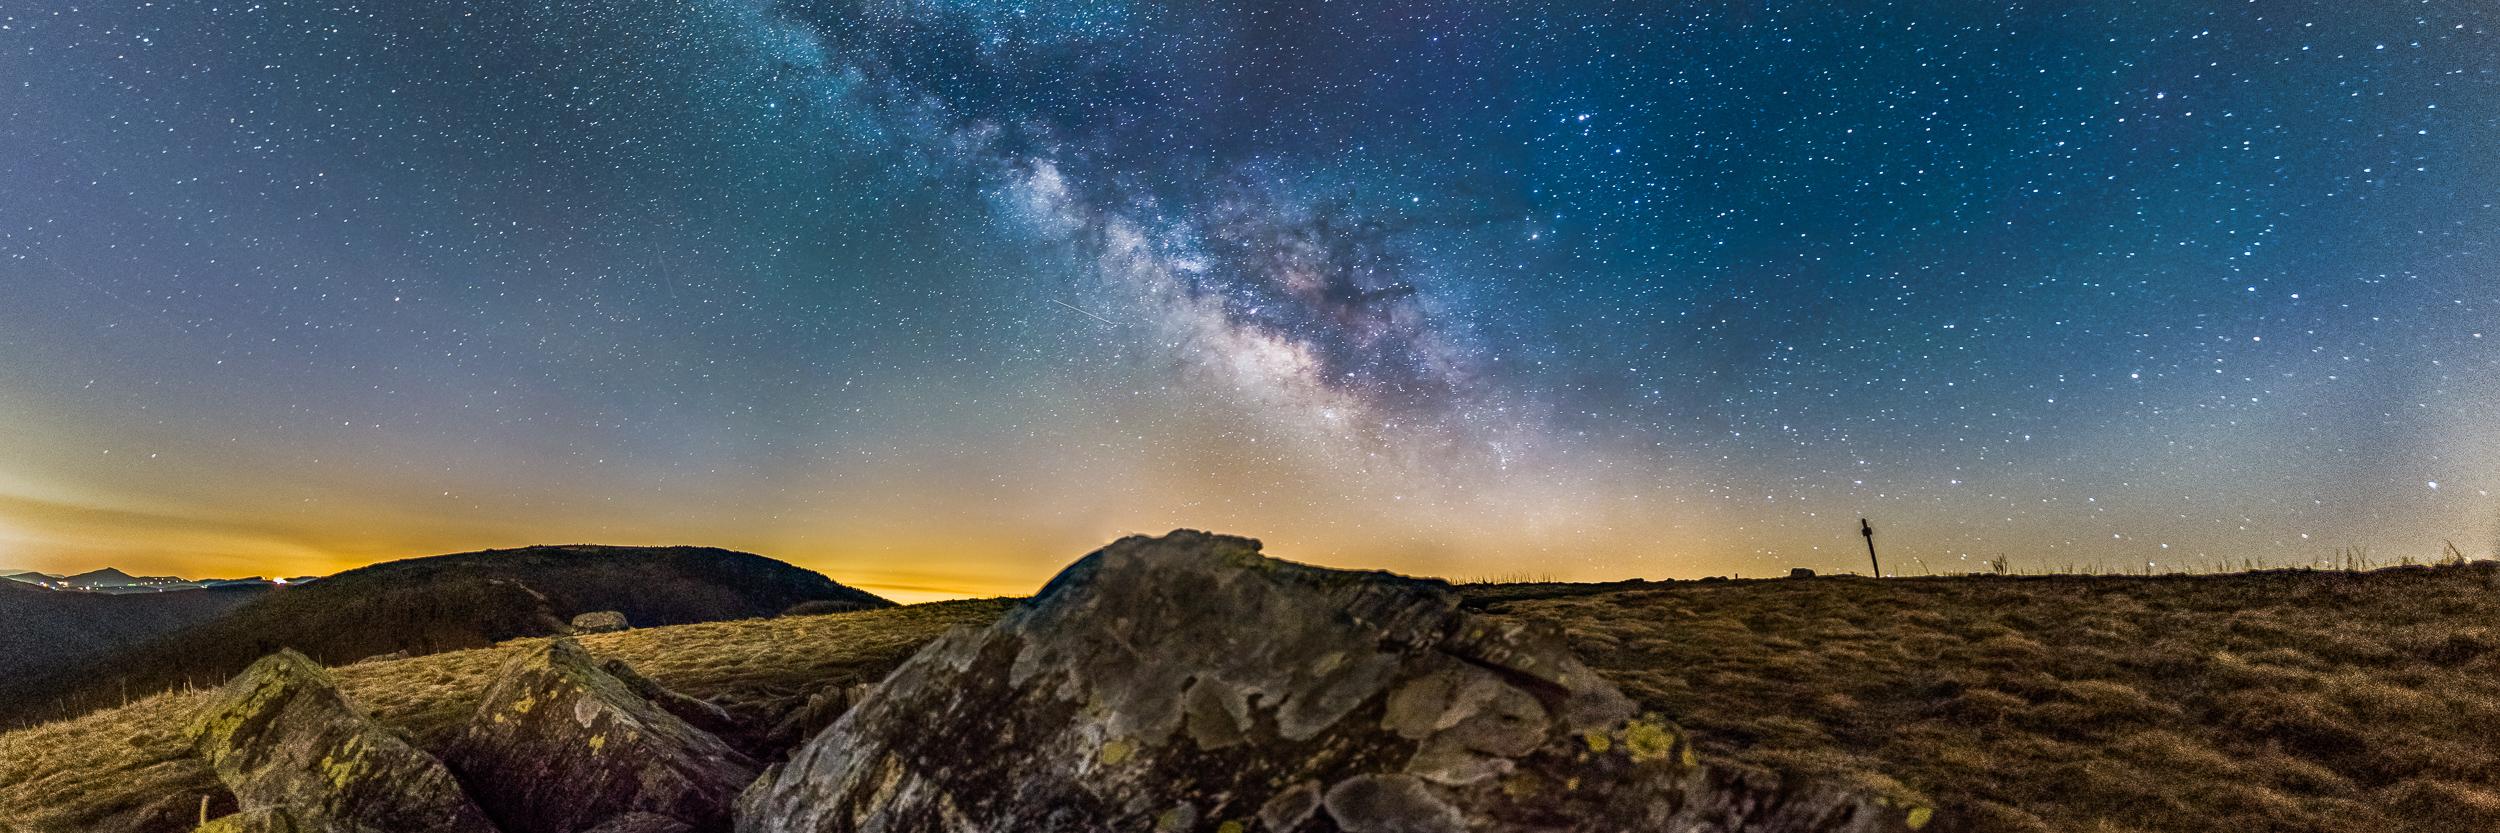 Roan Mountain Milky Way 2 (1x3)